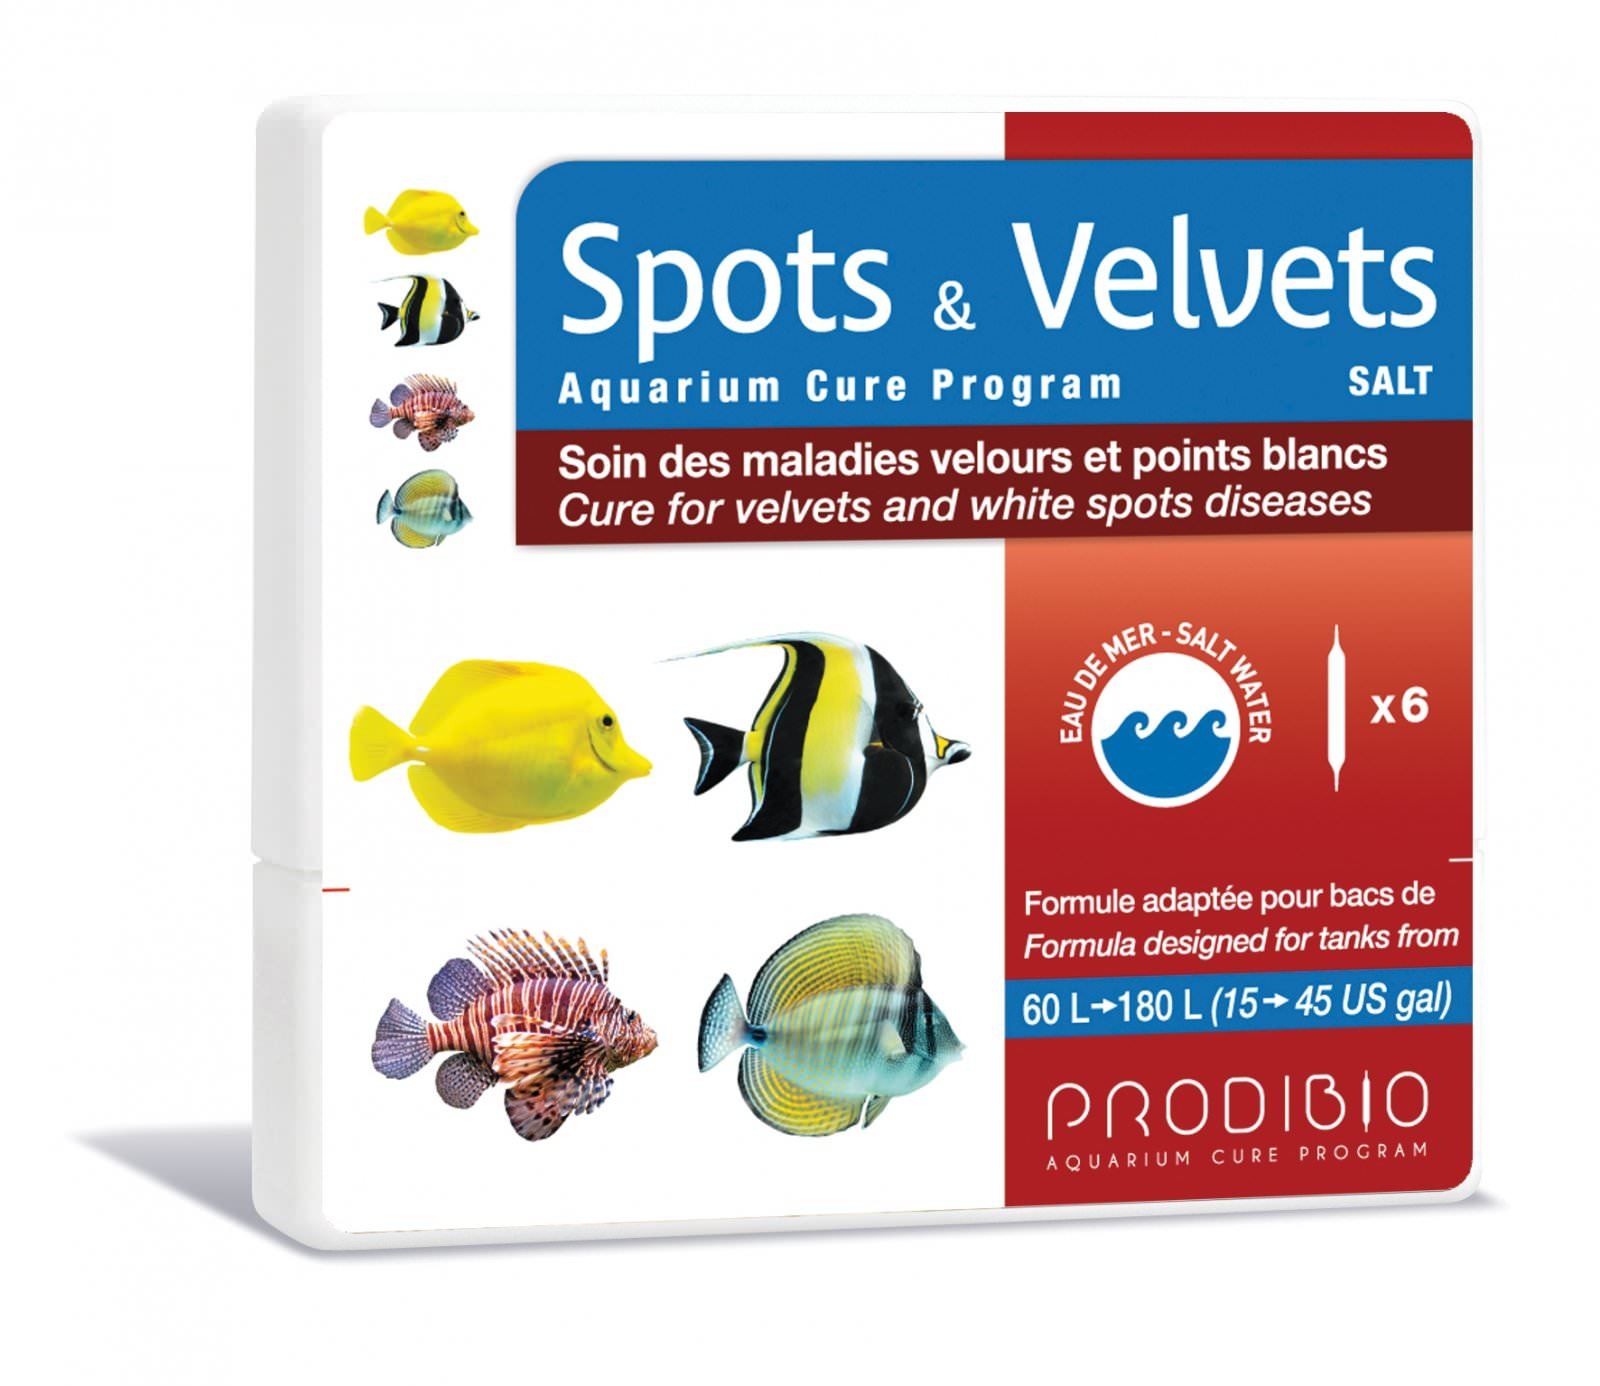 spots_velvets_salt_prodibio